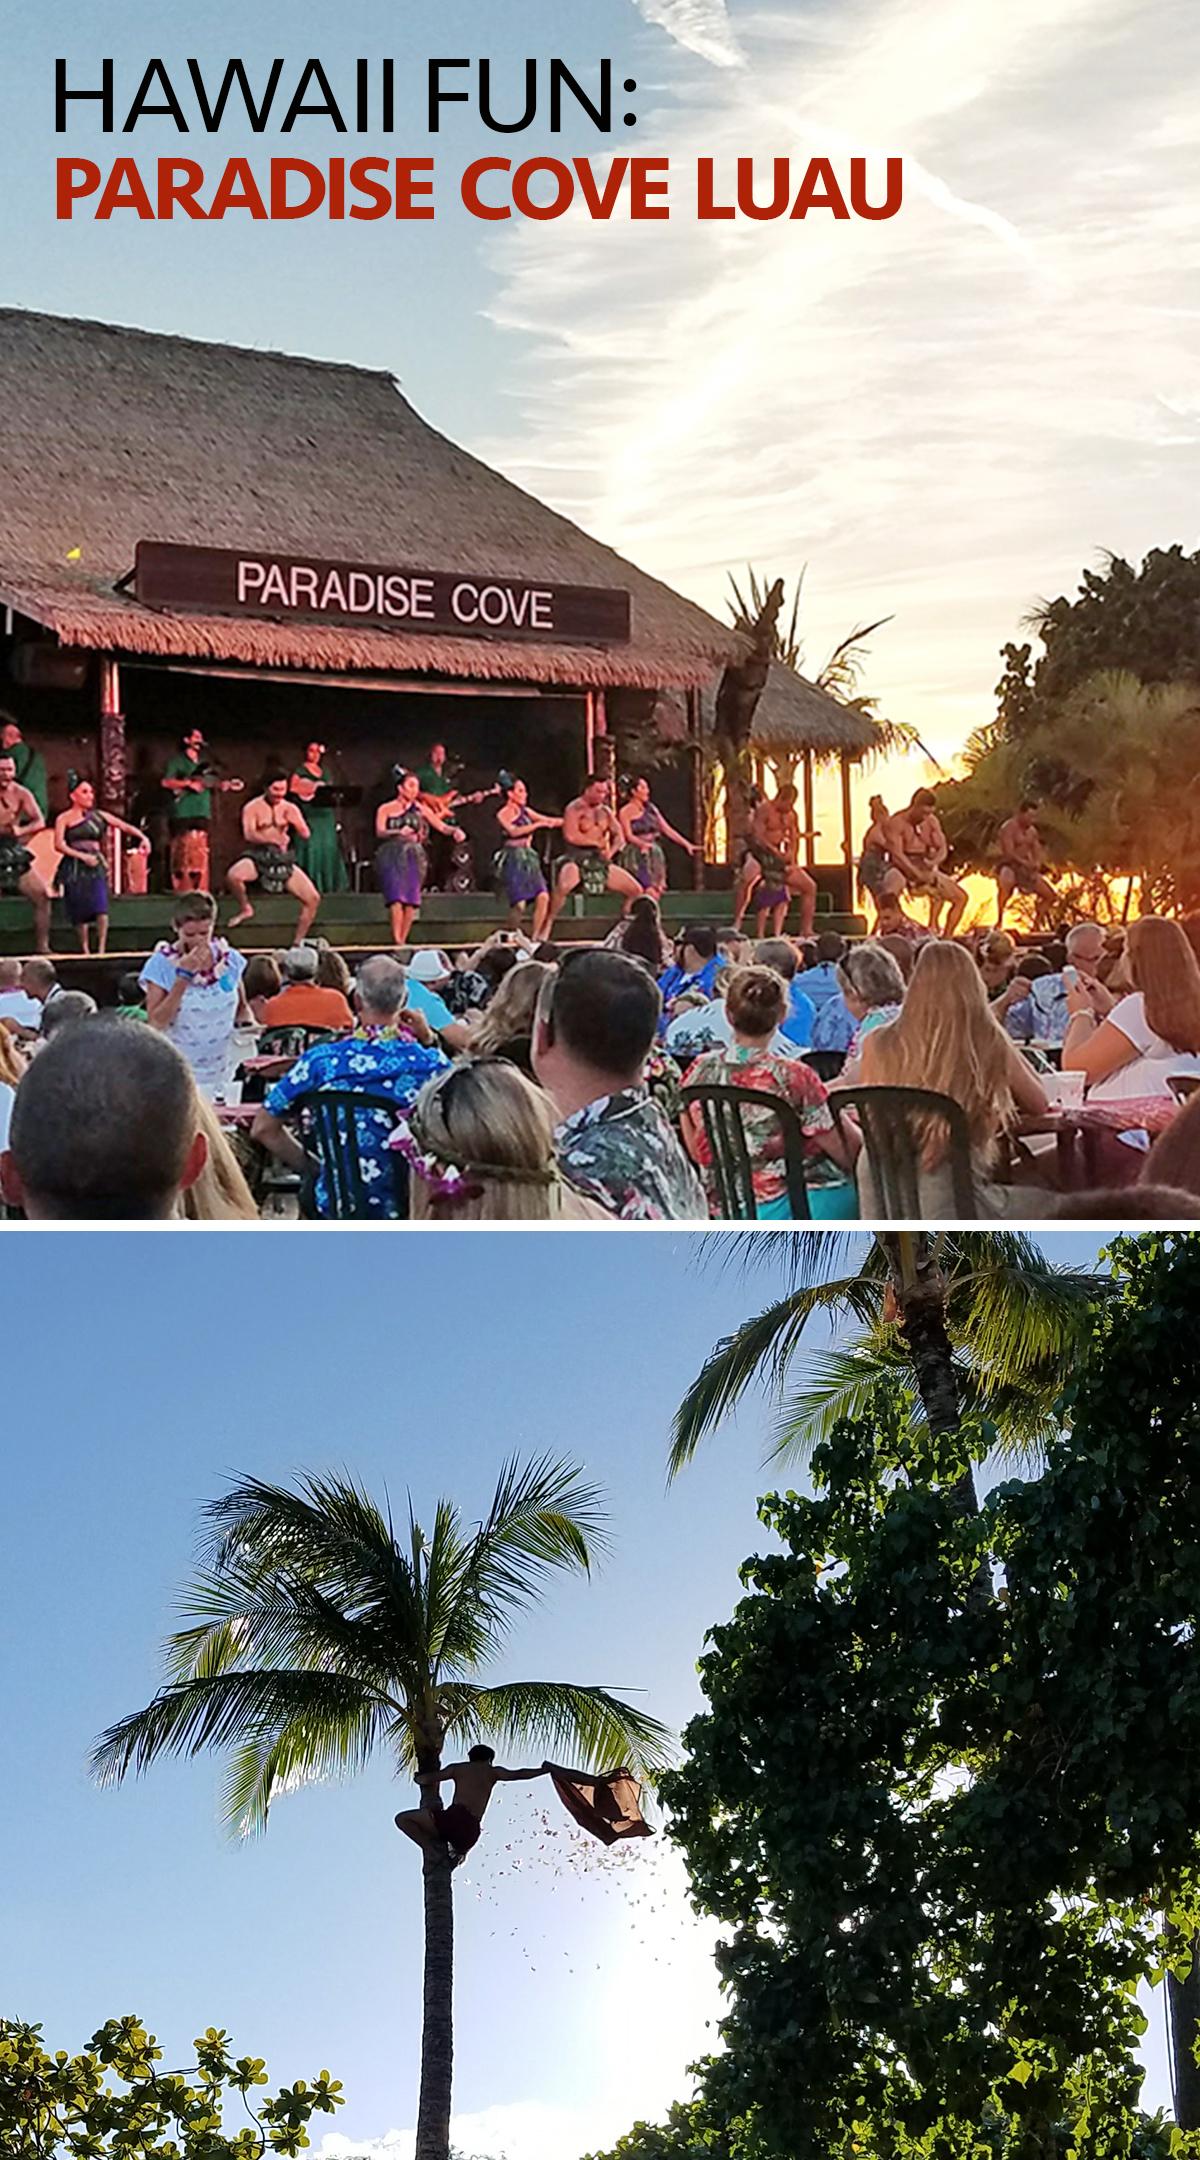 Hawaii Fun: Paradise Cove Luau